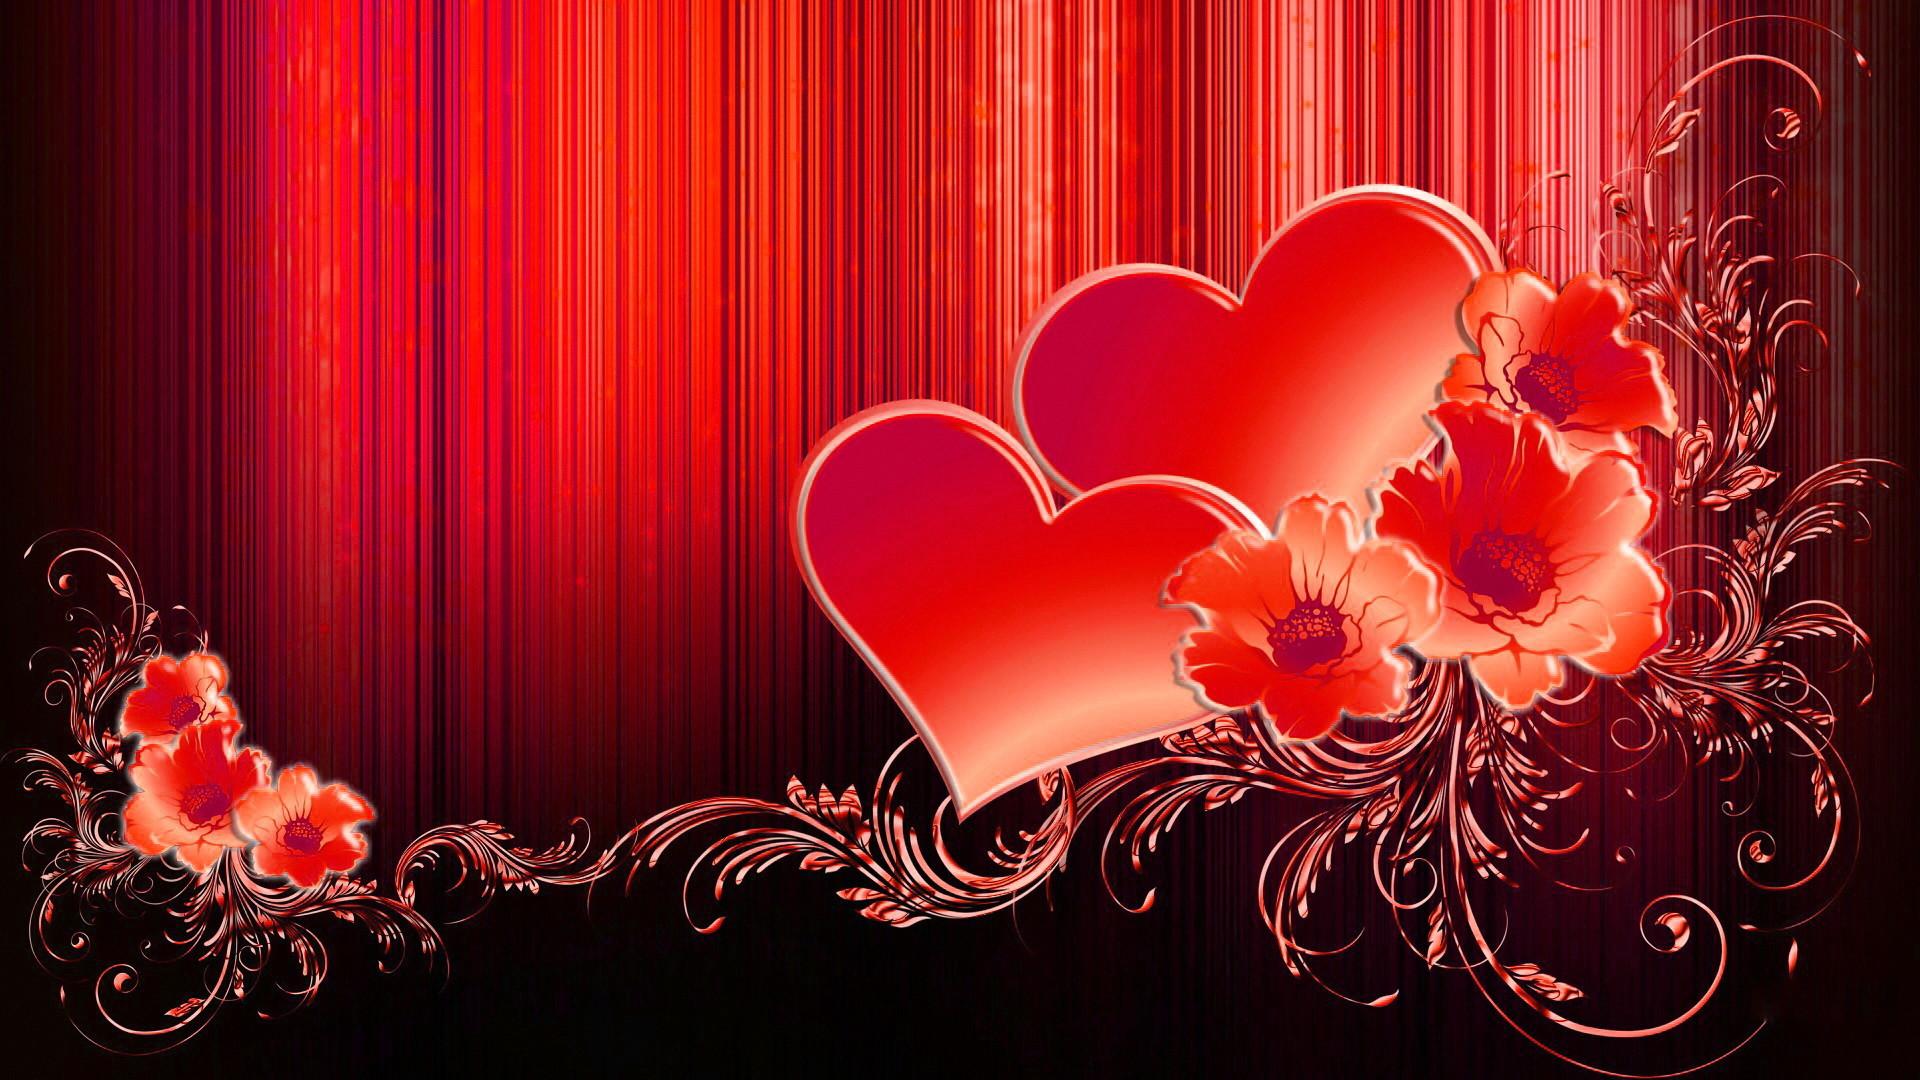 Love Heart Wallpaper Hd Wallpapertag: Valentine Hearts Wallpaper ·① WallpaperTag